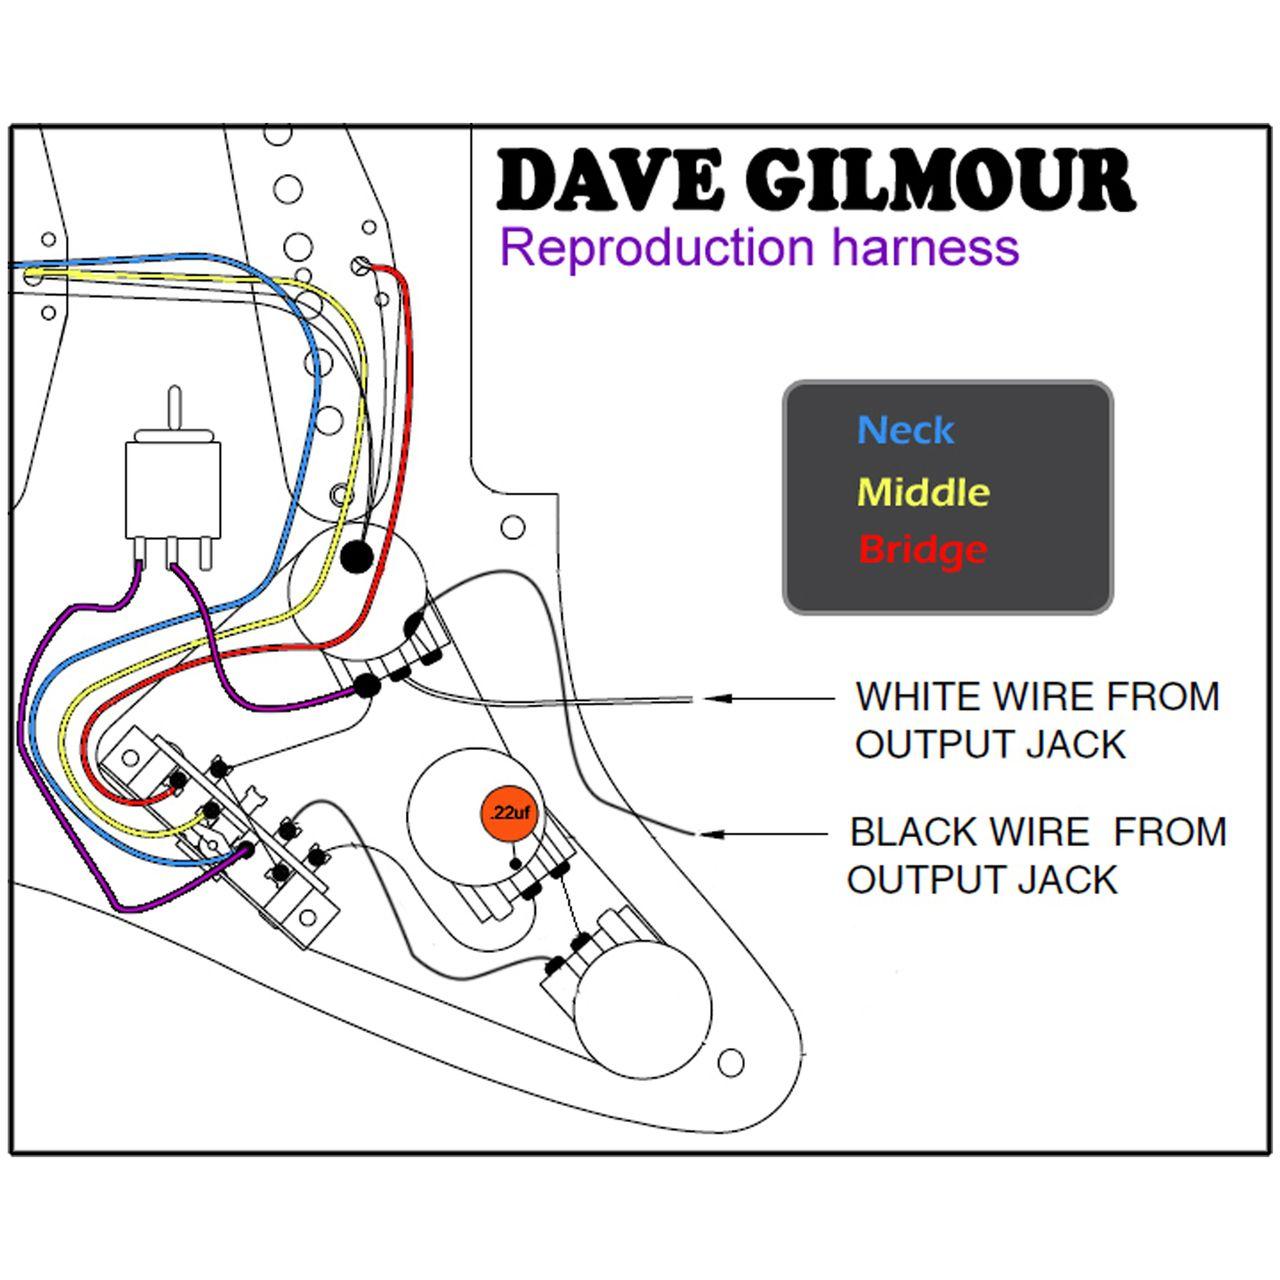 Super Dave Gilmour Deluxe Pre Wired Stratocaster Wiring Kit With Recessed Wiring Cloud Ittabpendurdonanfuldomelitekicepsianuembamohammedshrineorg